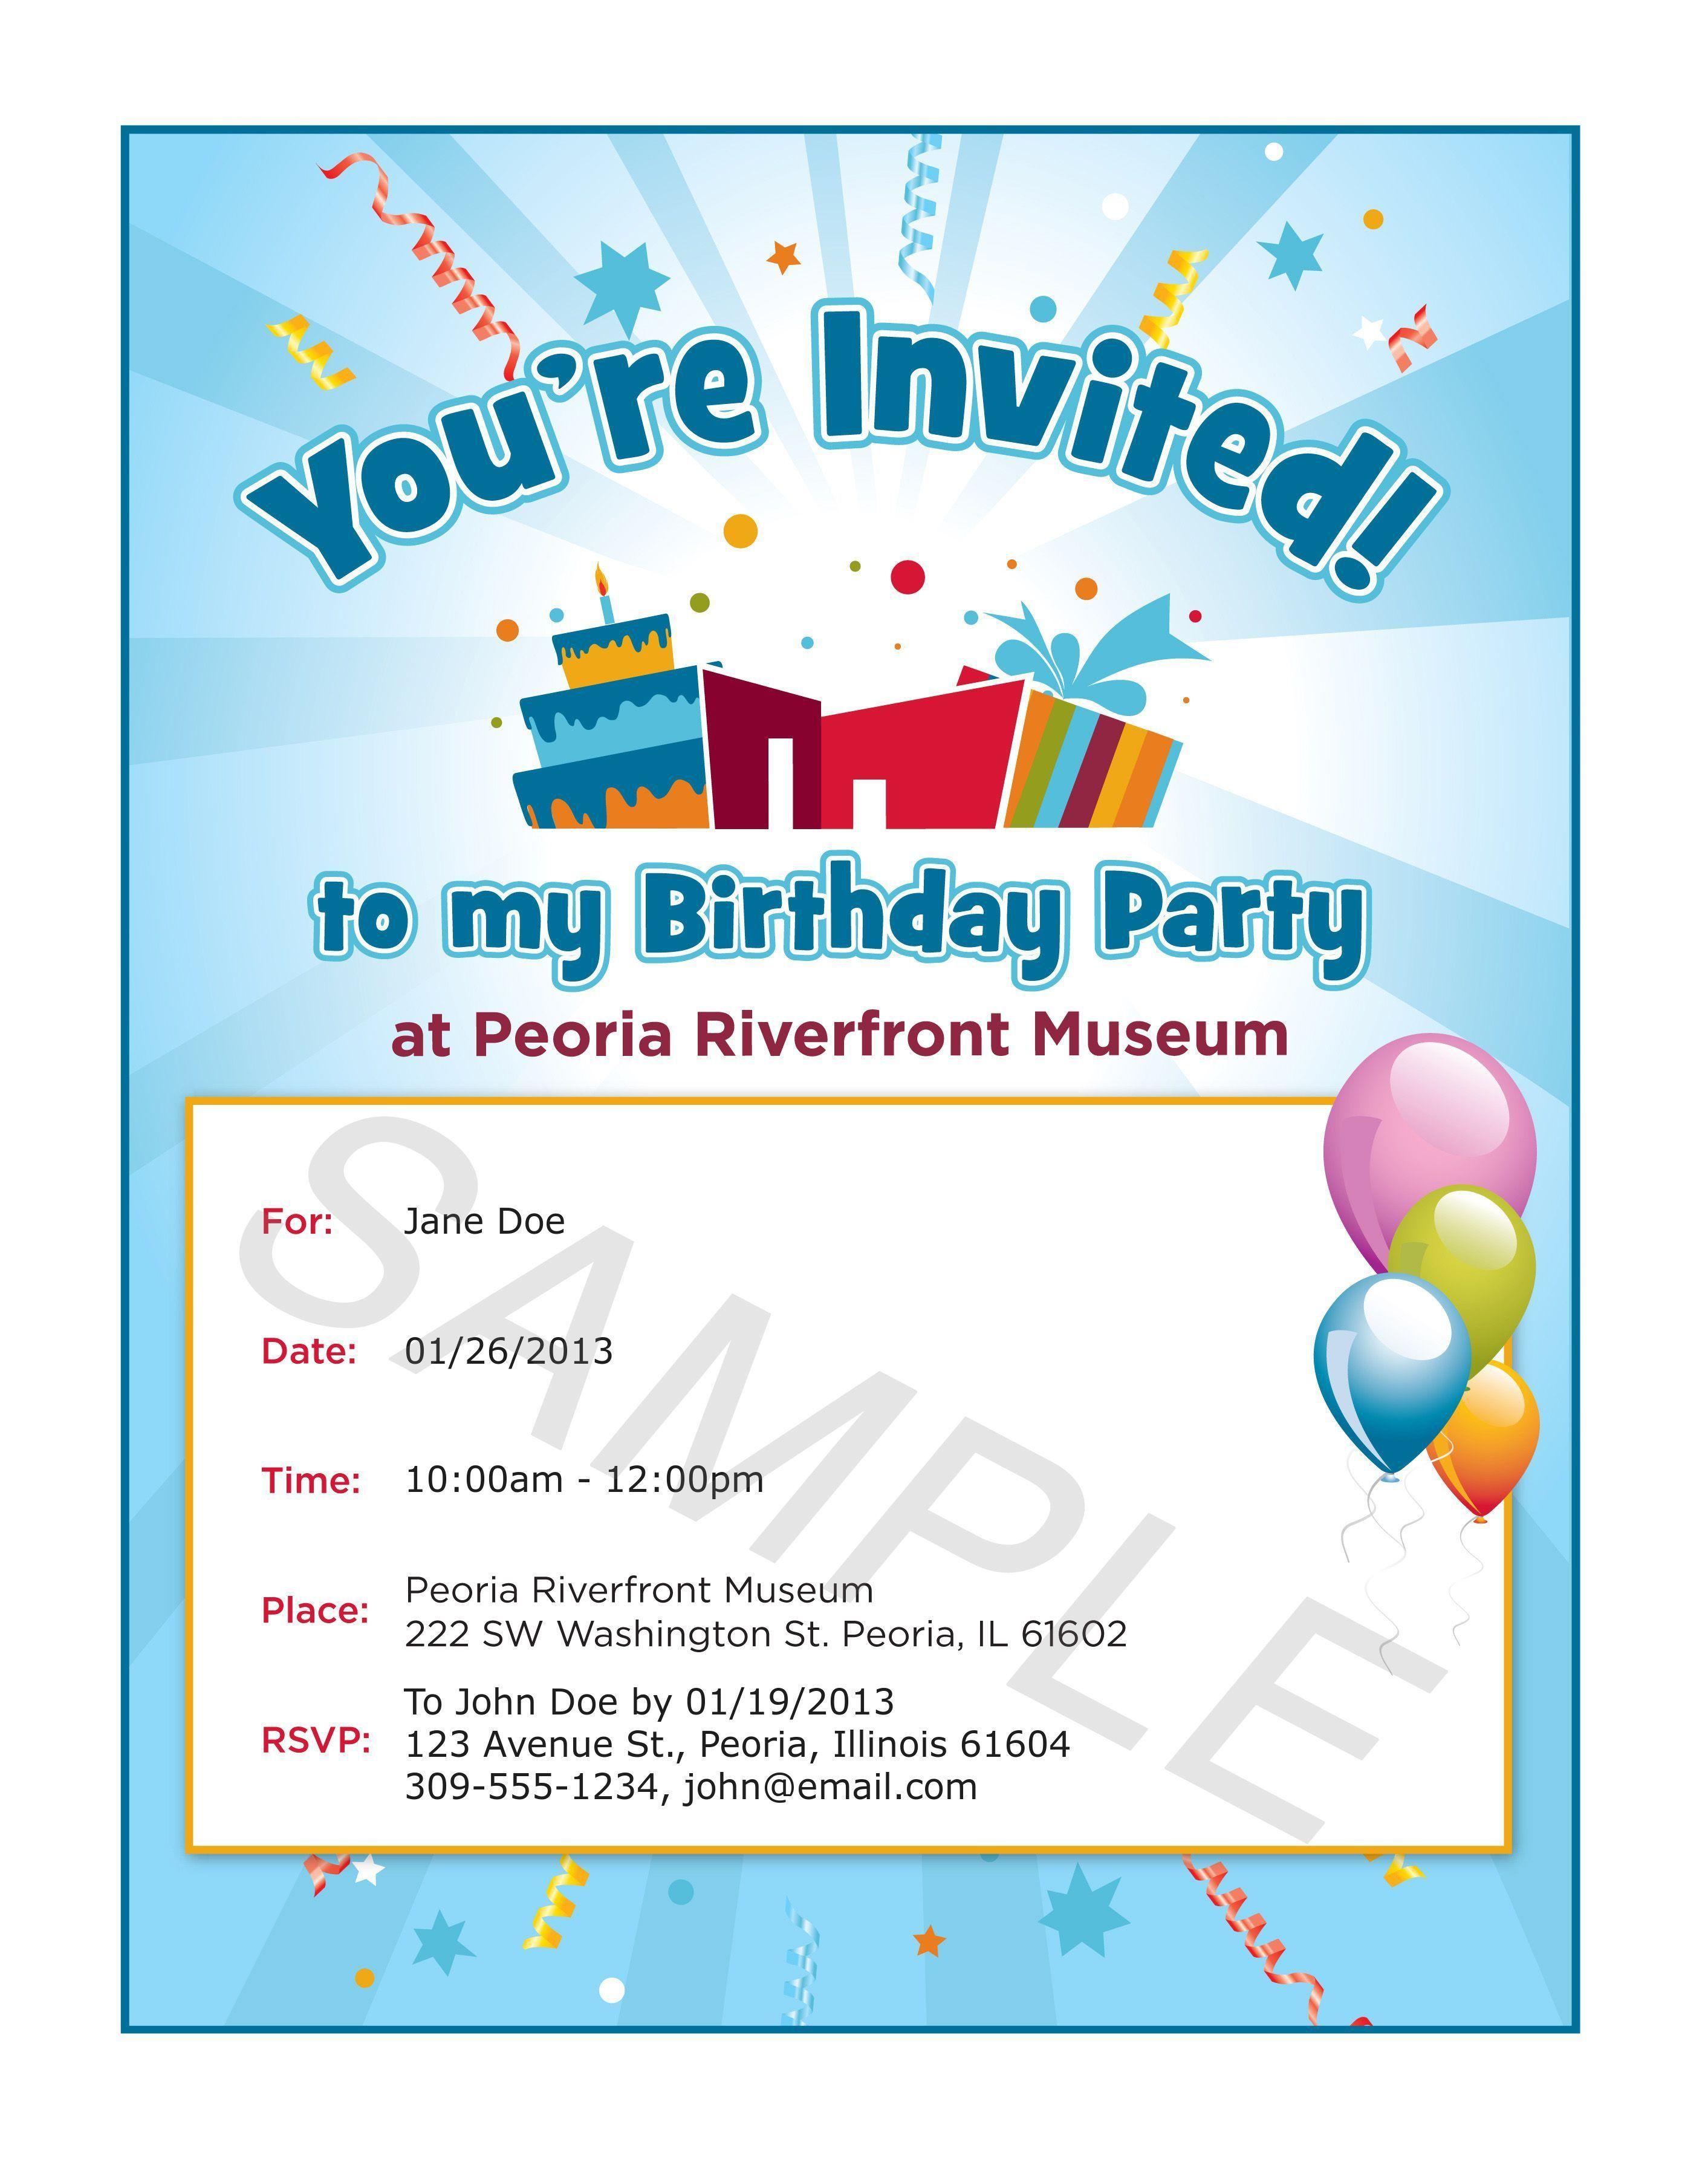 002 Fascinating Birthday Party Invitation Template Word Idea  40th Wording Sample Unicorn FreeFull